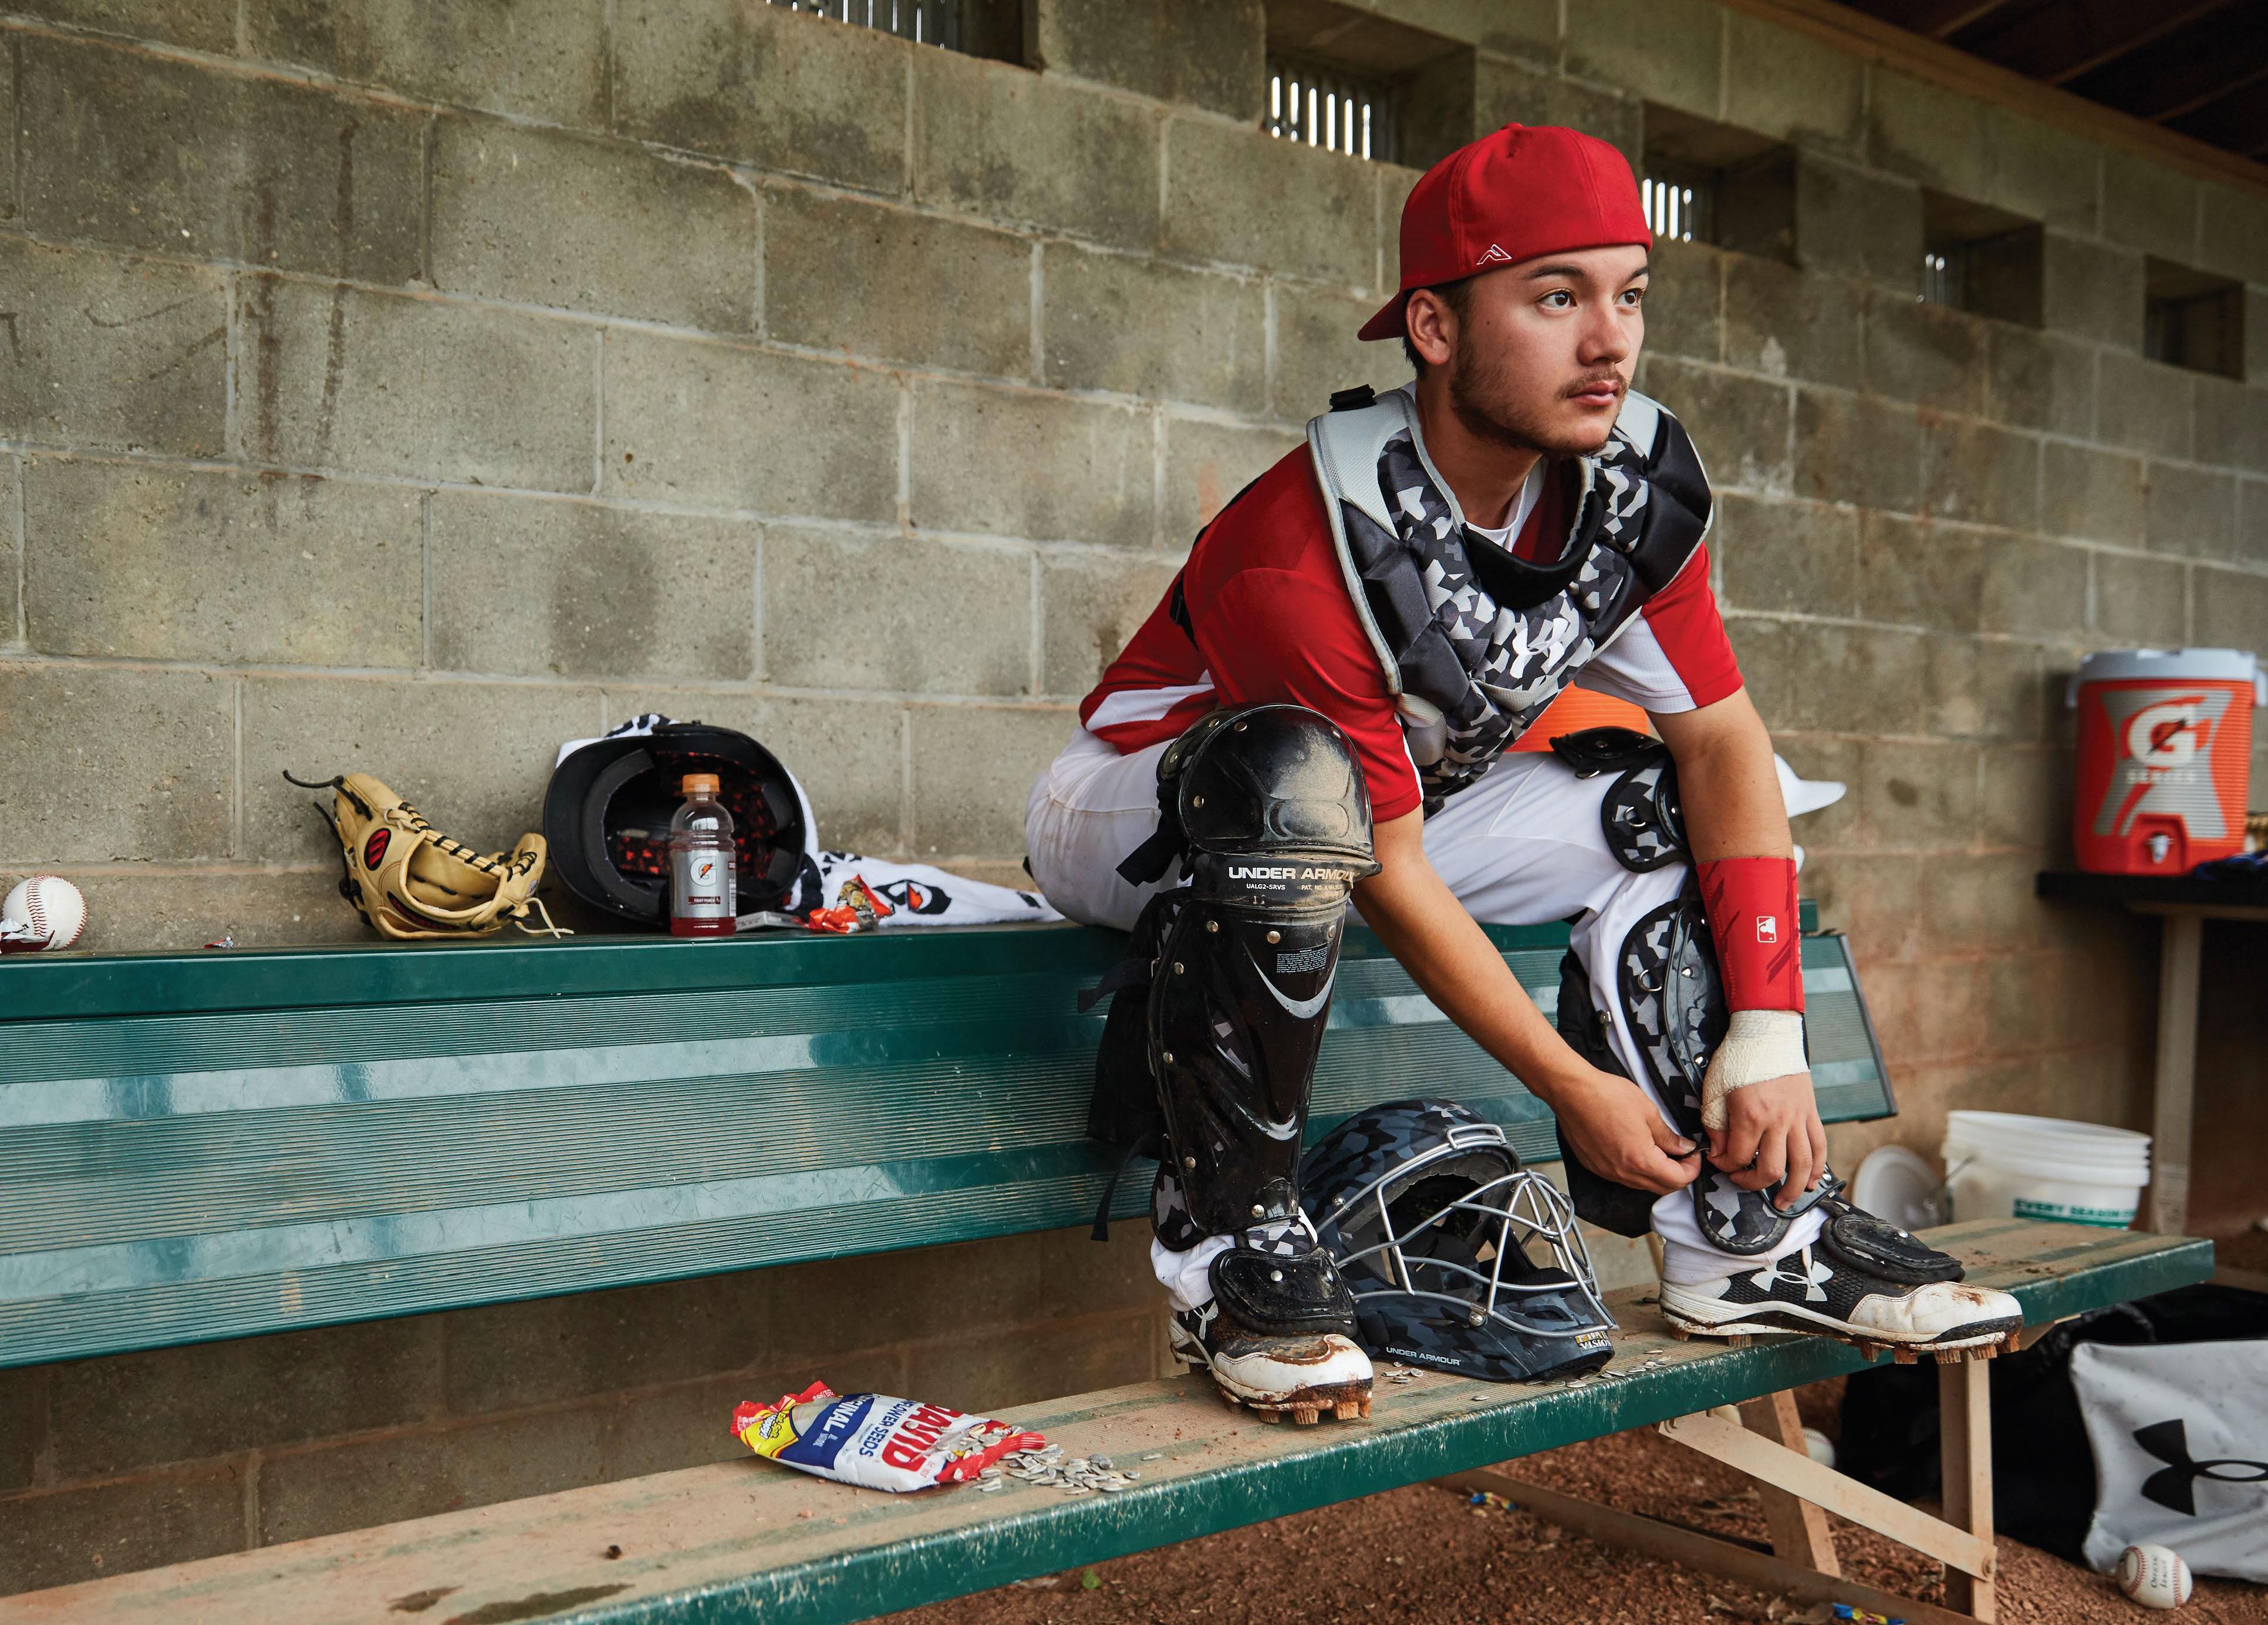 Baseball Catcher's Accessories